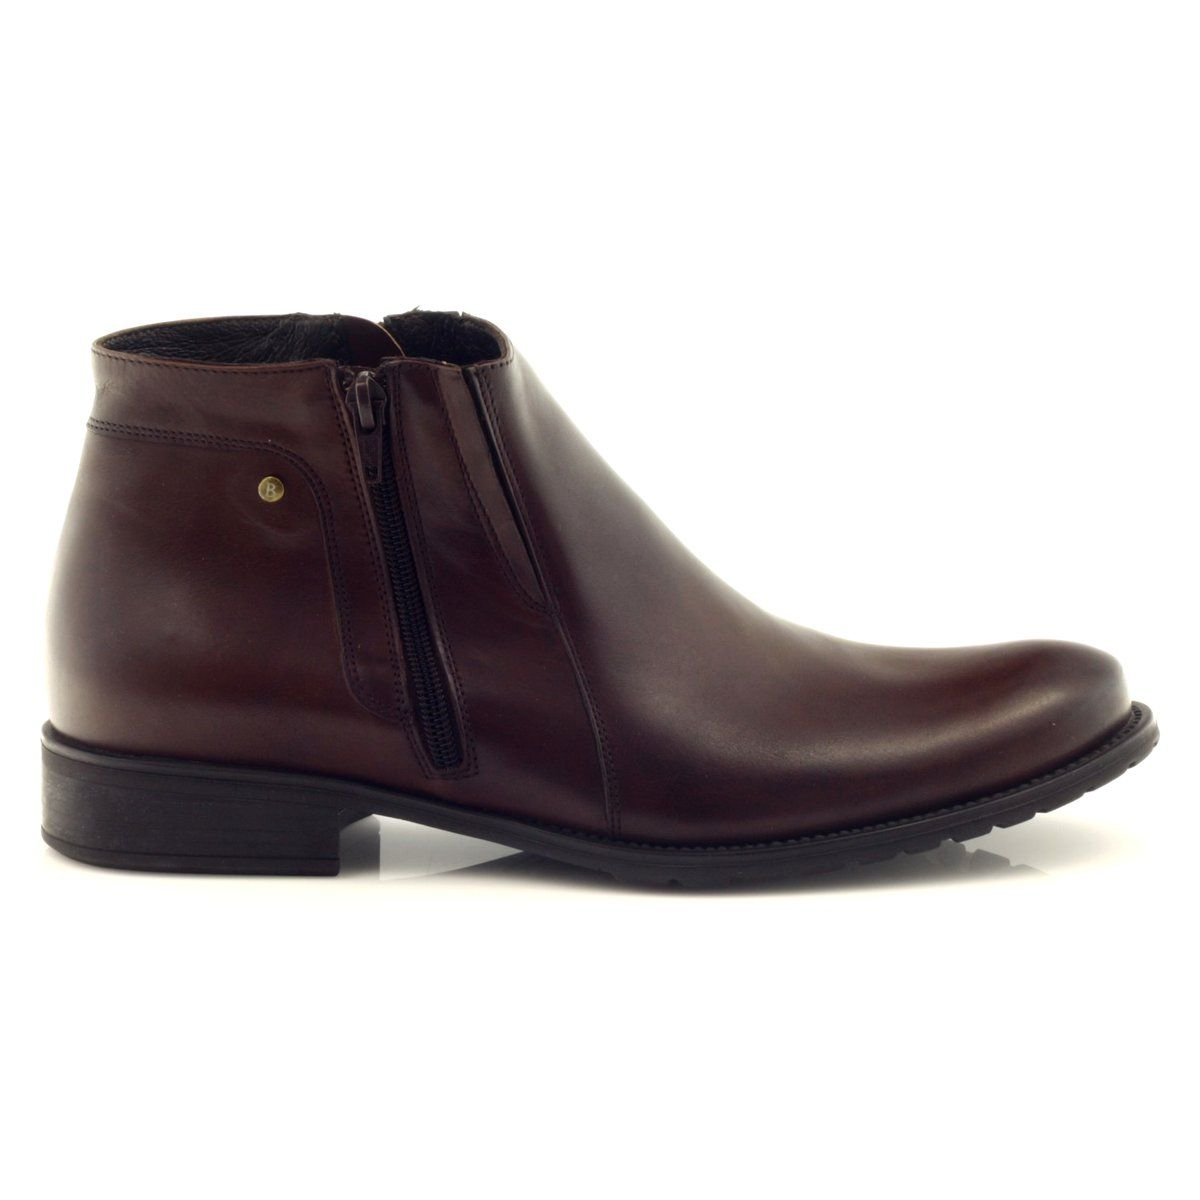 Botki Meskie Zimowe Badura 5108 Brazowe Mens Winter Boots Boots Winter Boots